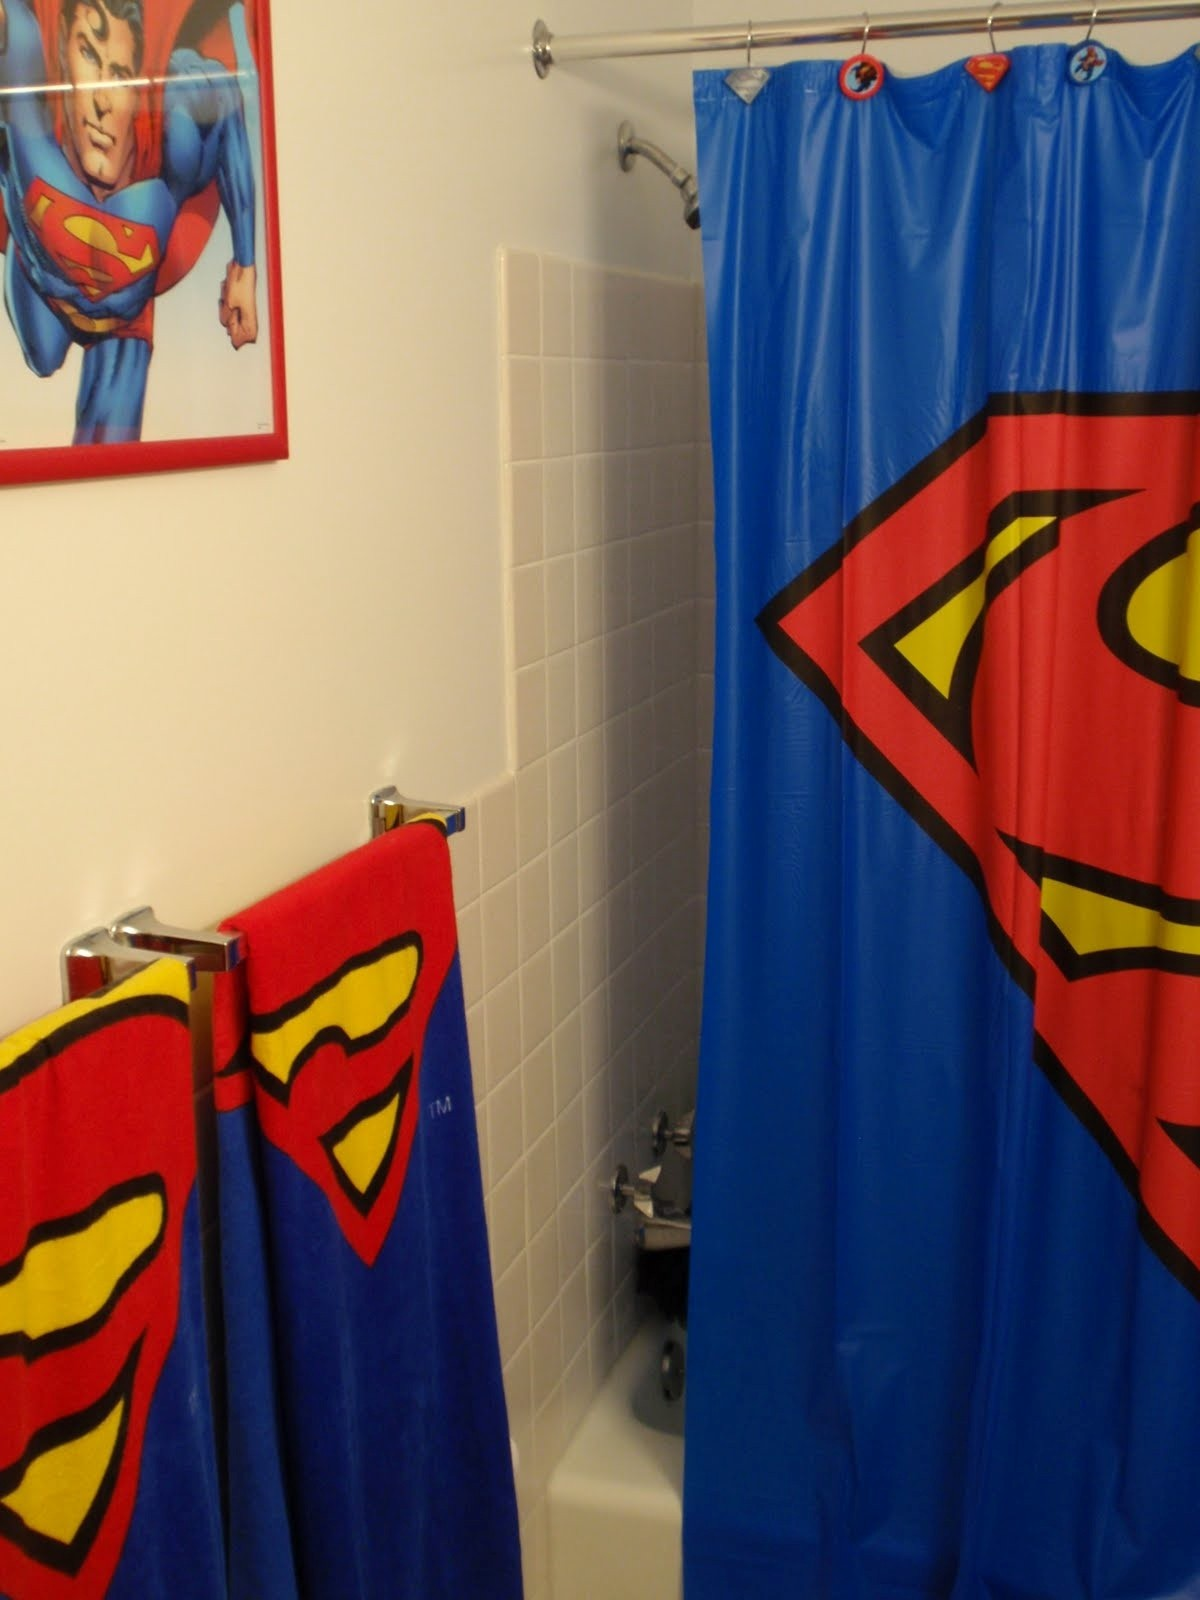 Incroyable Superman Bathroom Set Sensational Ideas Superman Bath And Body Set Superman  Bathroom Set Superman Inspiration